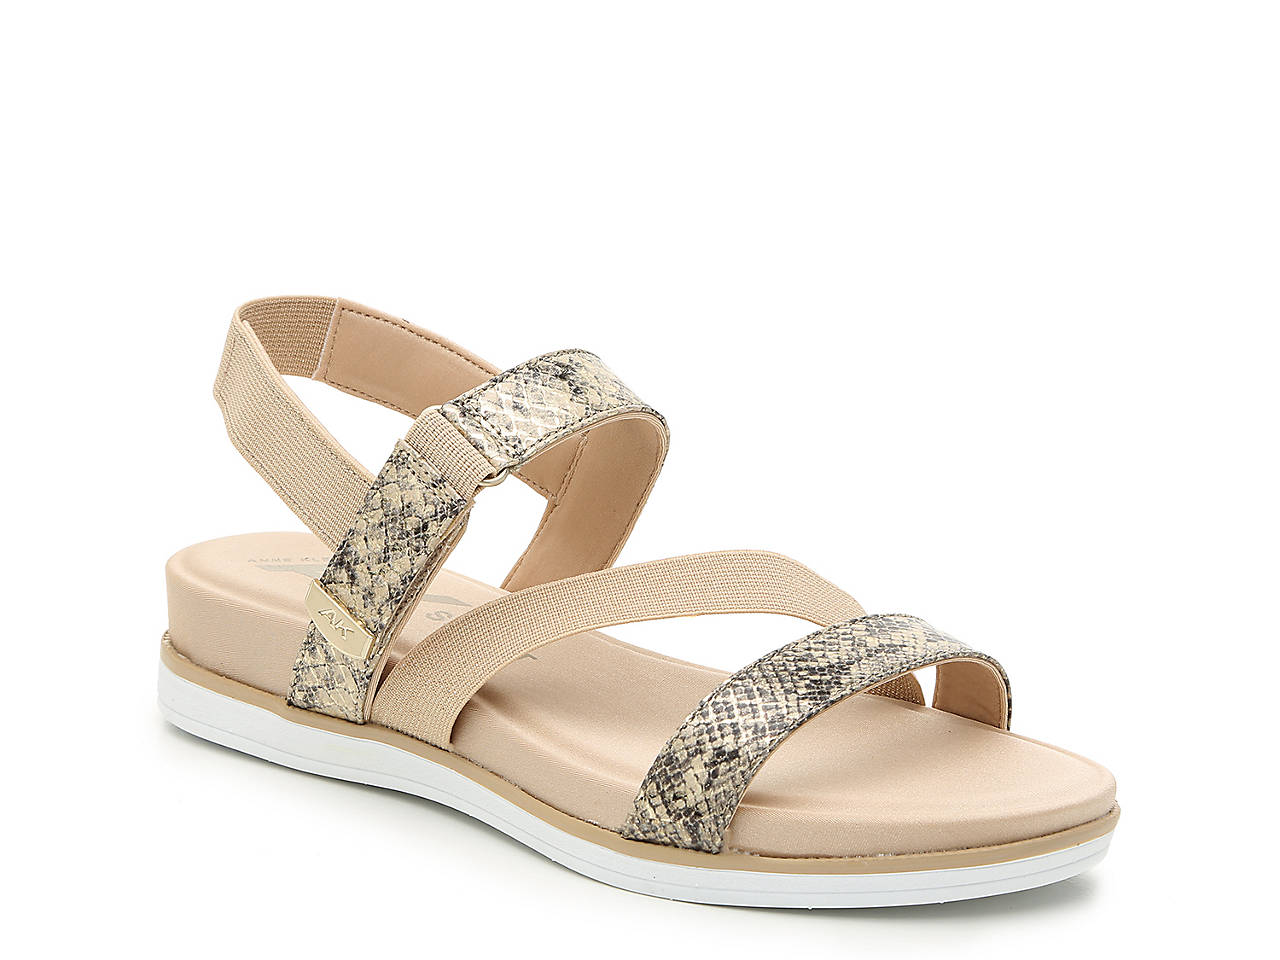 82fc3872595 Anne Klein Sport Nolita Wedge Sandal Women s Shoes